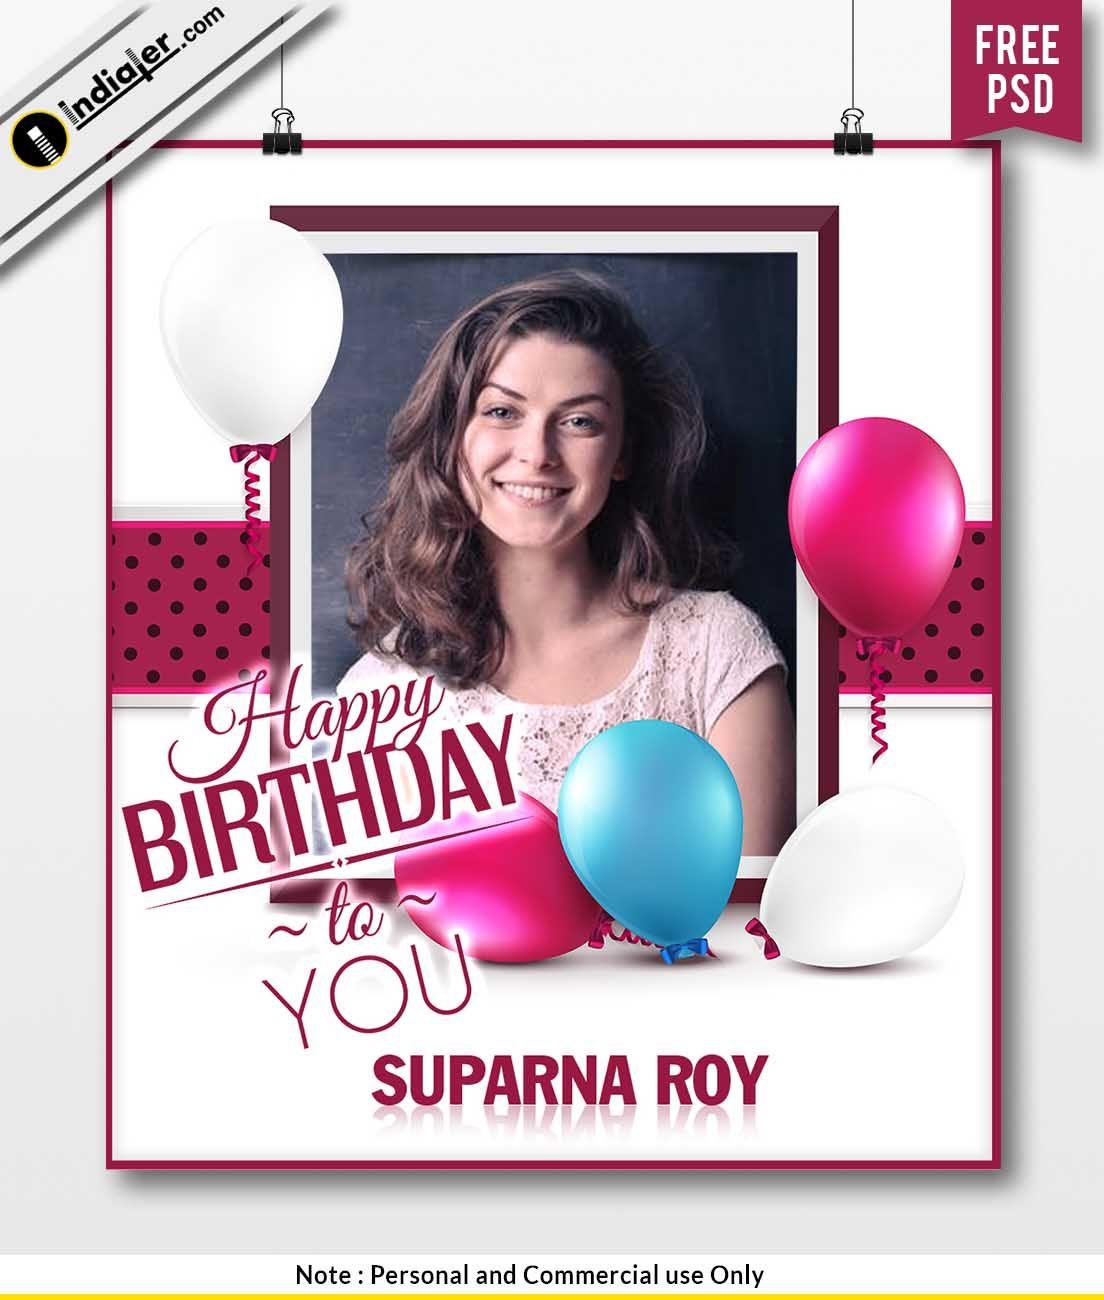 Free Birthday Wishes Photo Frame And Balloon Psd Template Free Birthday Wishes Birthday Wishes With Photo Free Birthday Stuff